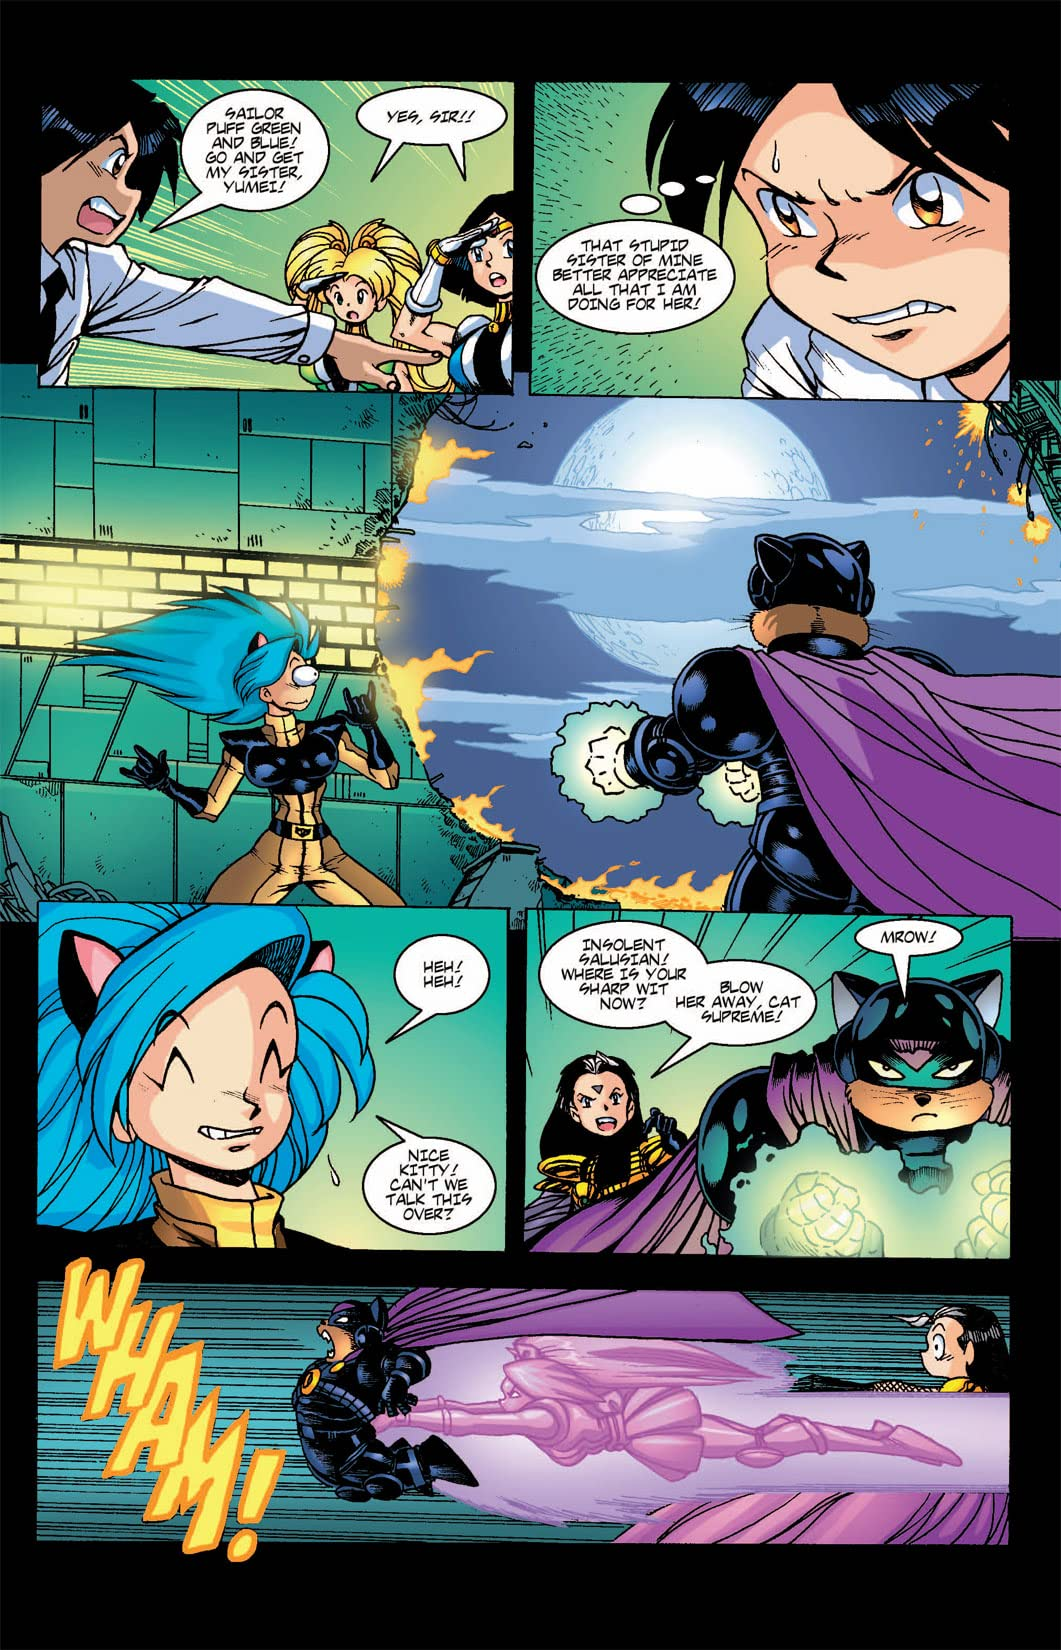 Ninja High School Vol. 2 #9